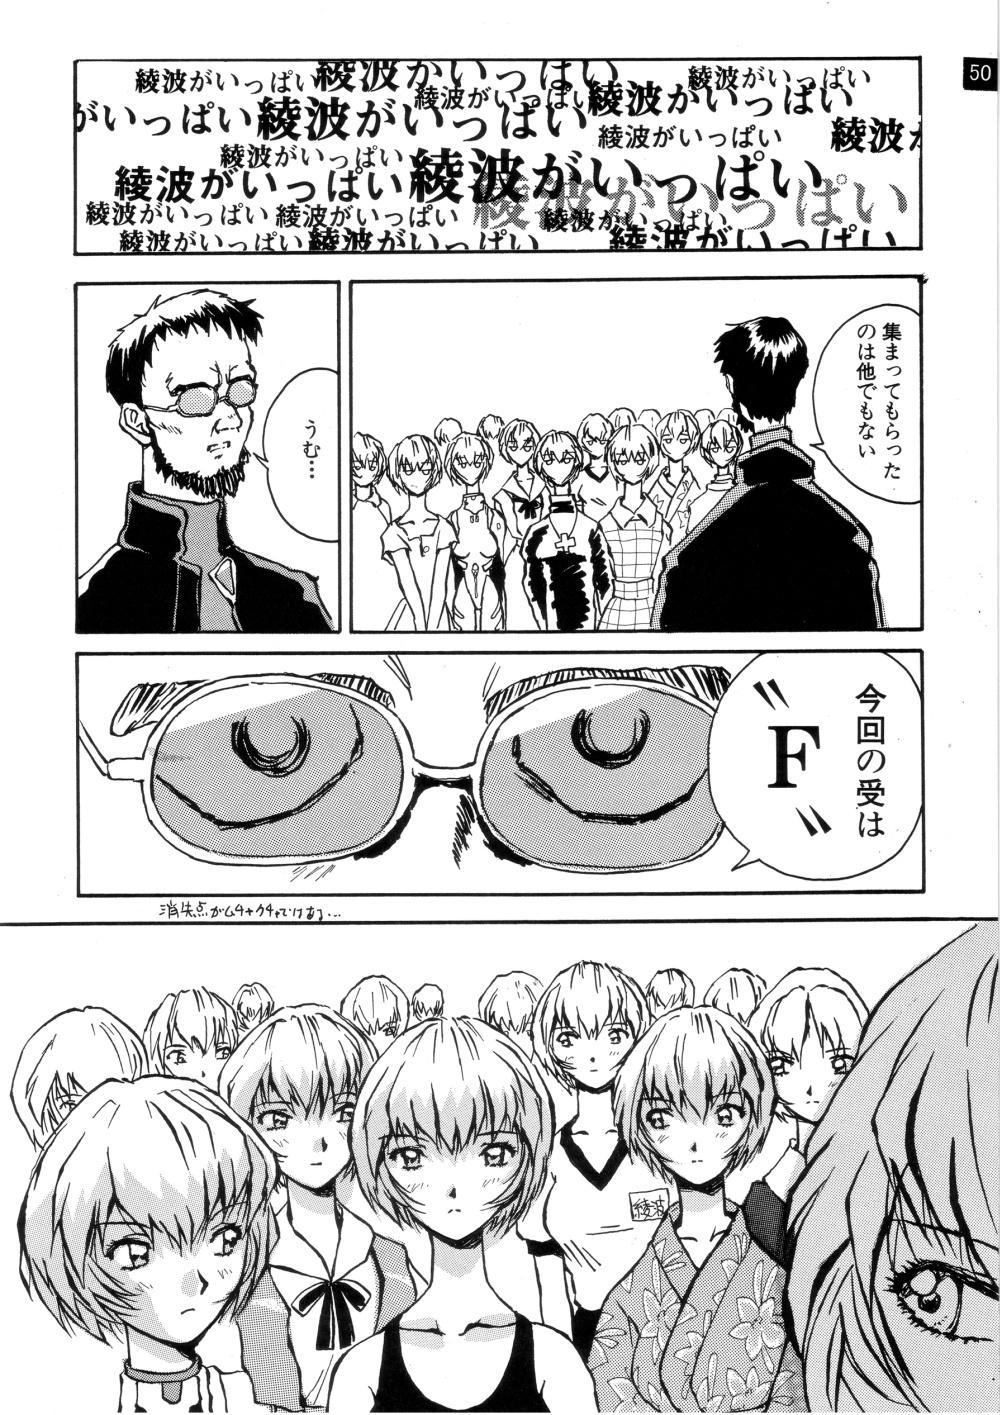 Zense Ki no Evangerikosan 50